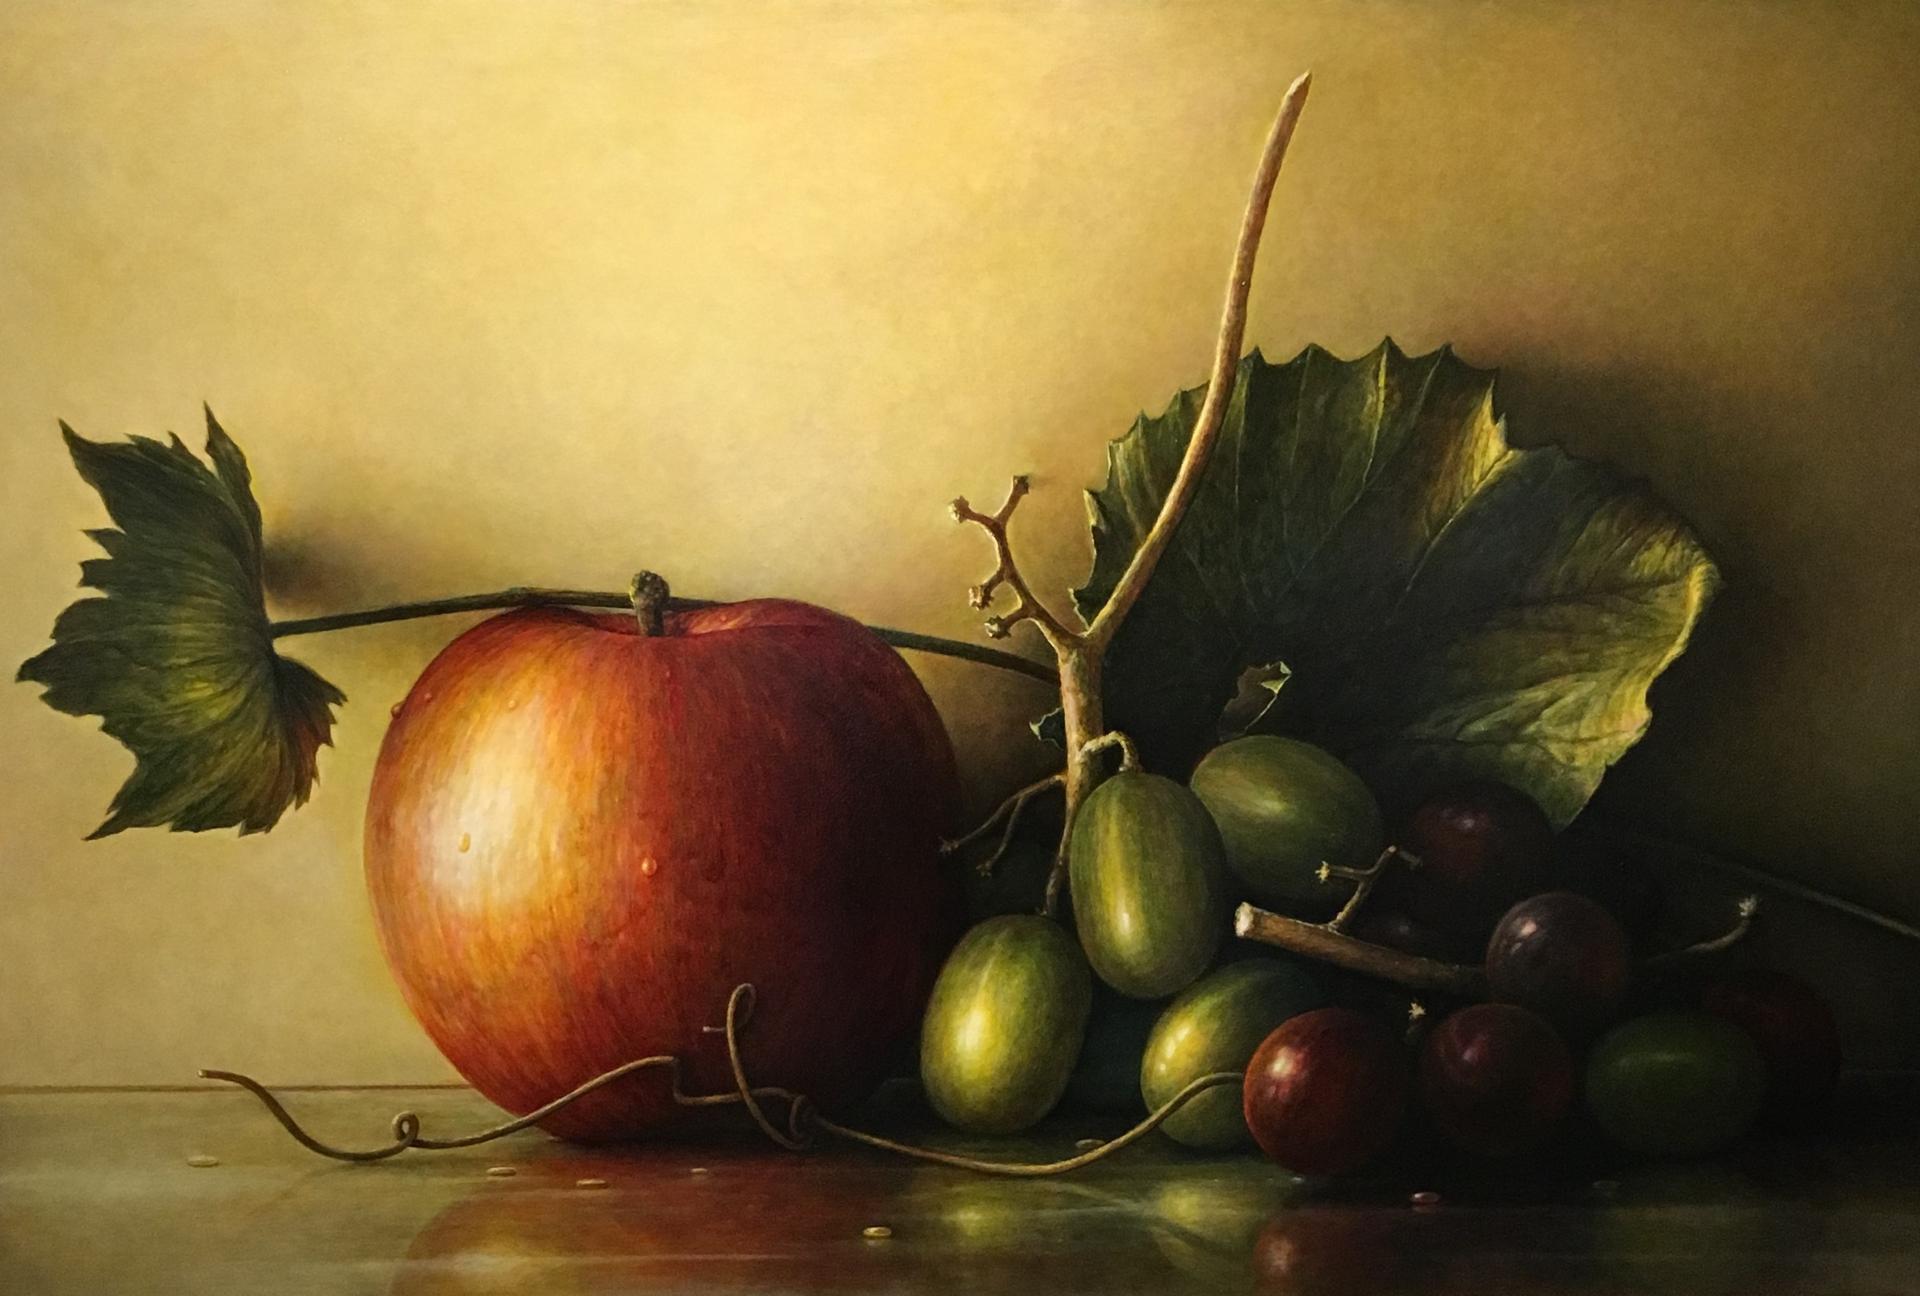 bobbi's apples by James DelGrosso